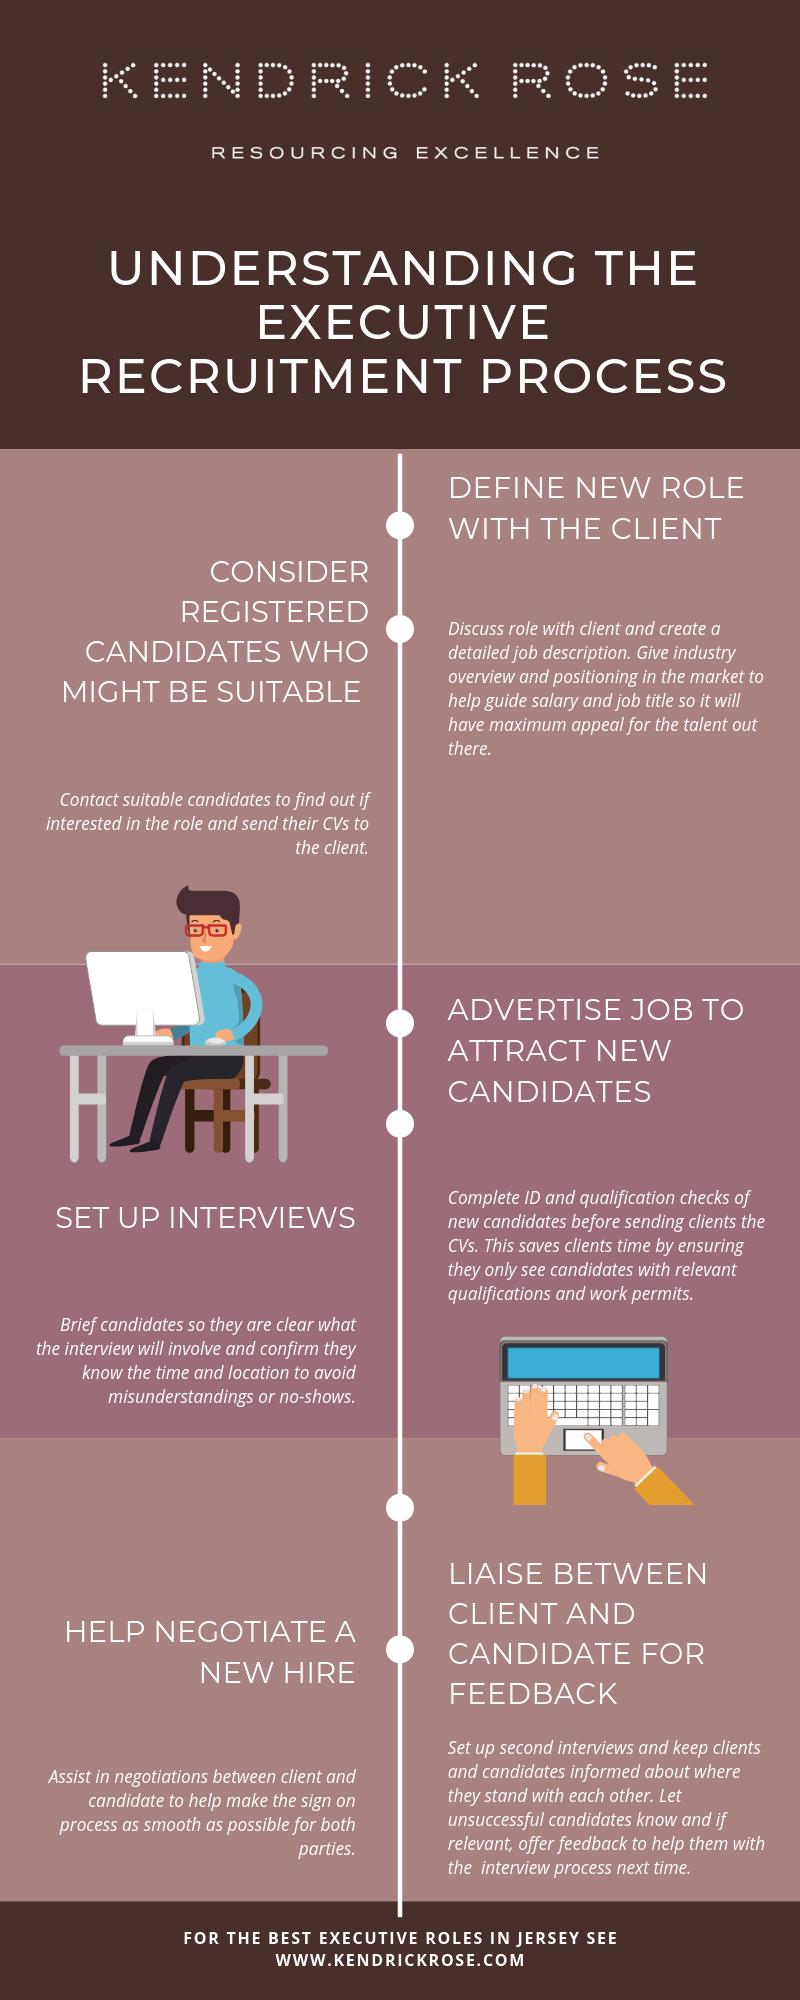 Executive Recruitment Process Infographic 2